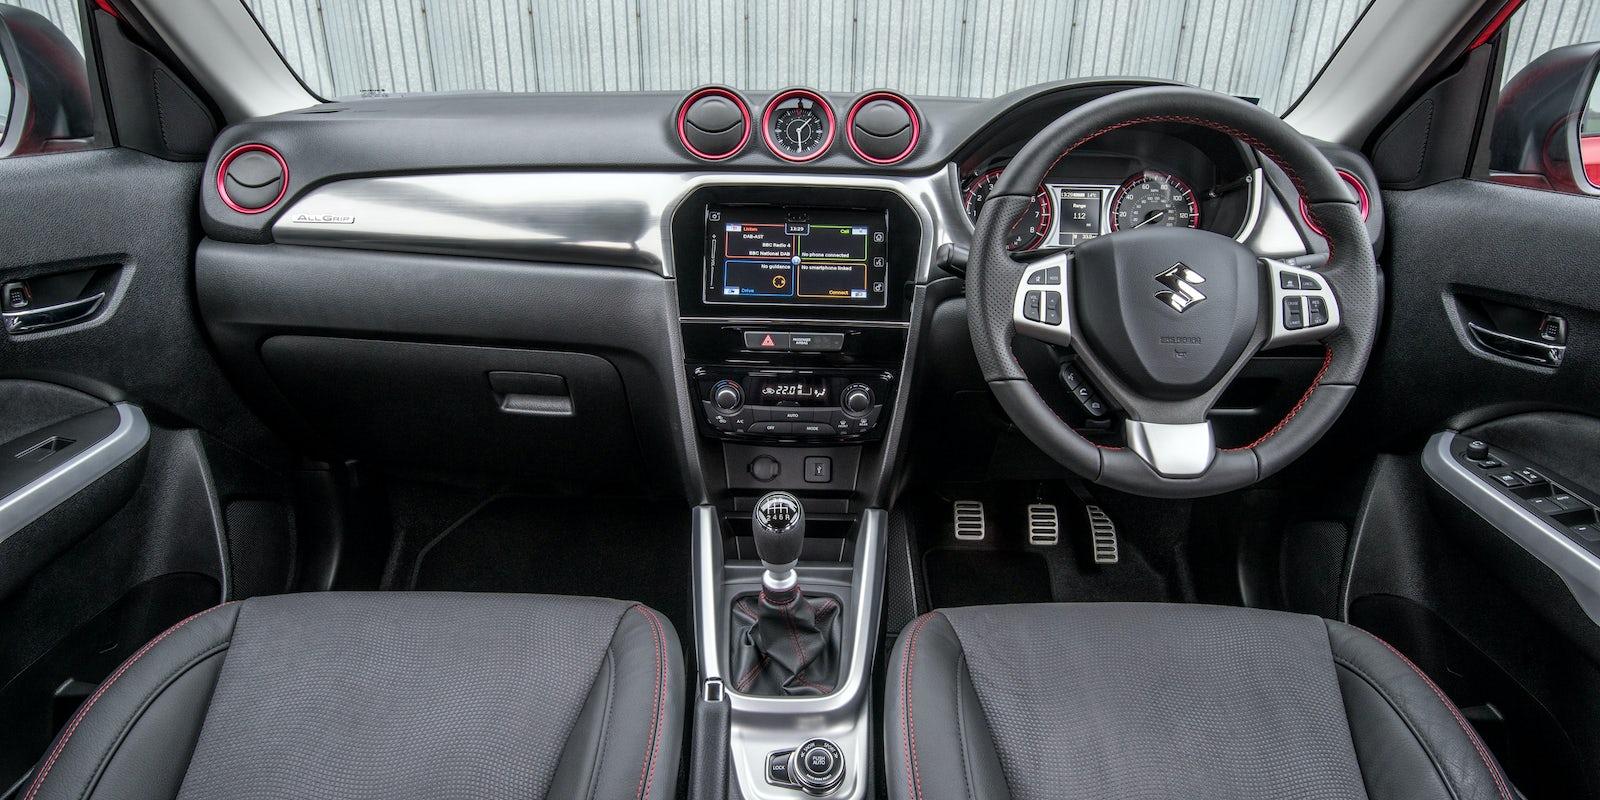 Rolls Royce Dealers >> Suzuki Vitara Interior & Infotainment | carwow